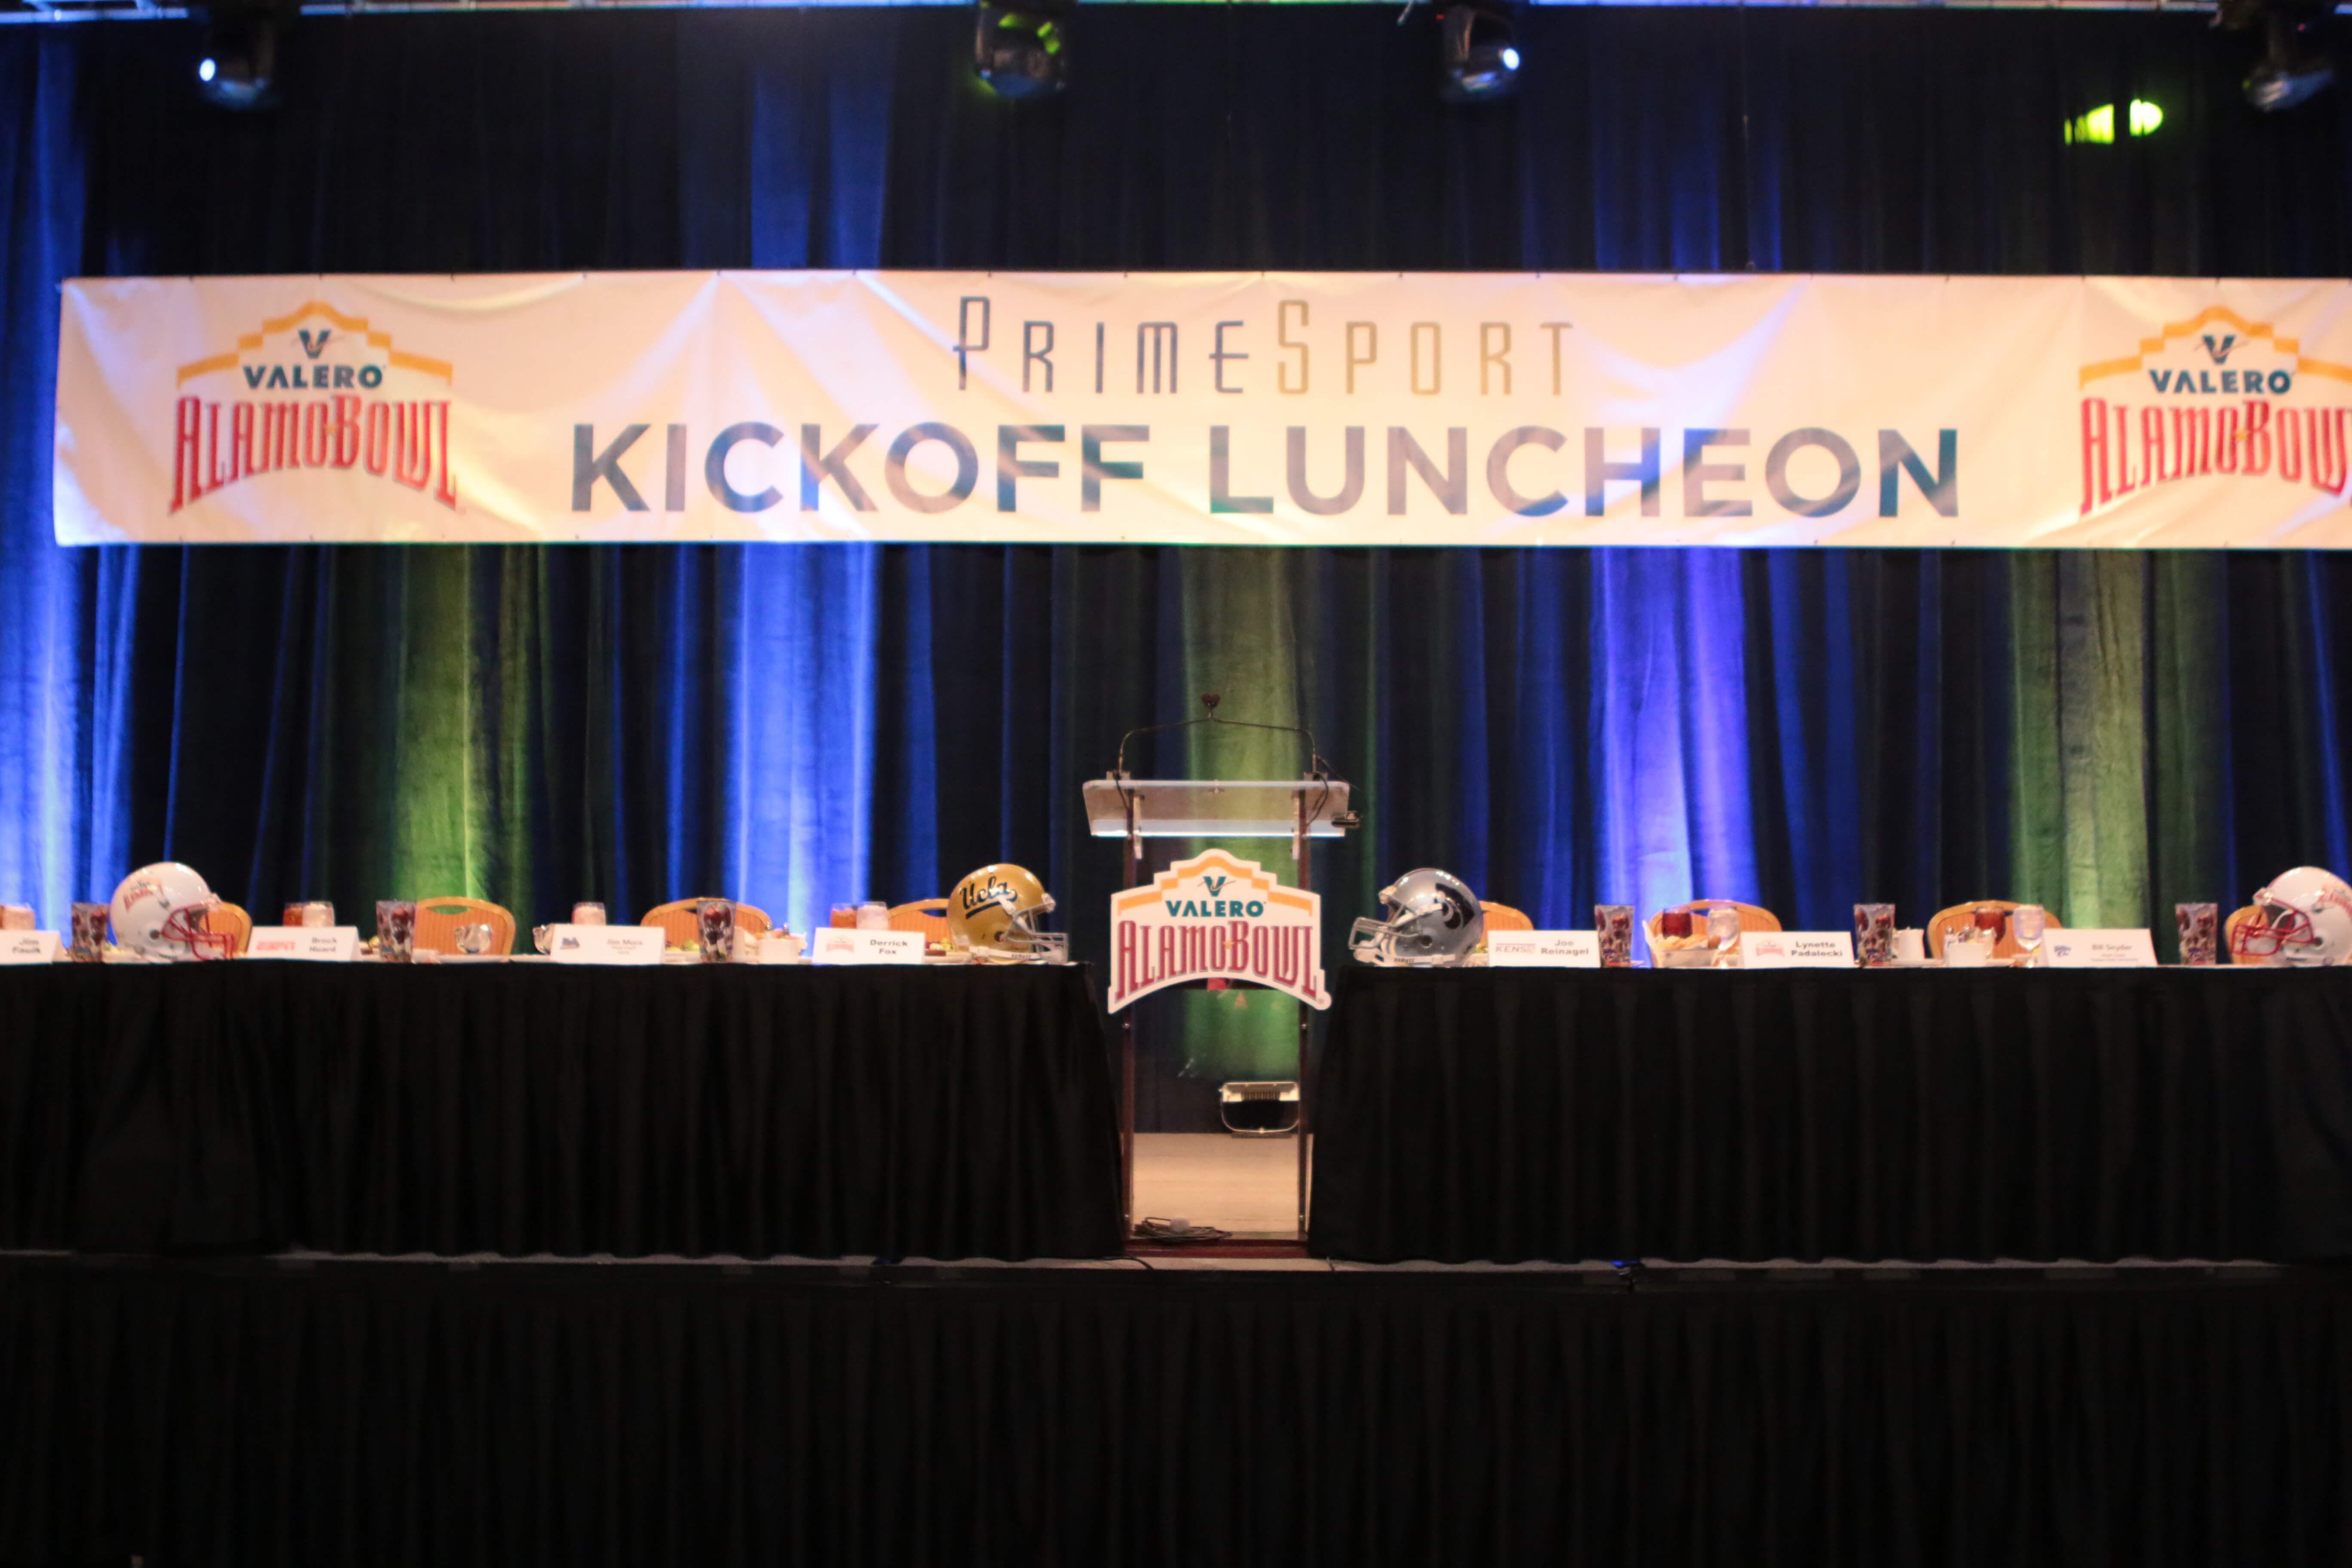 Primesport Luncheon Valero Alamo Bowl